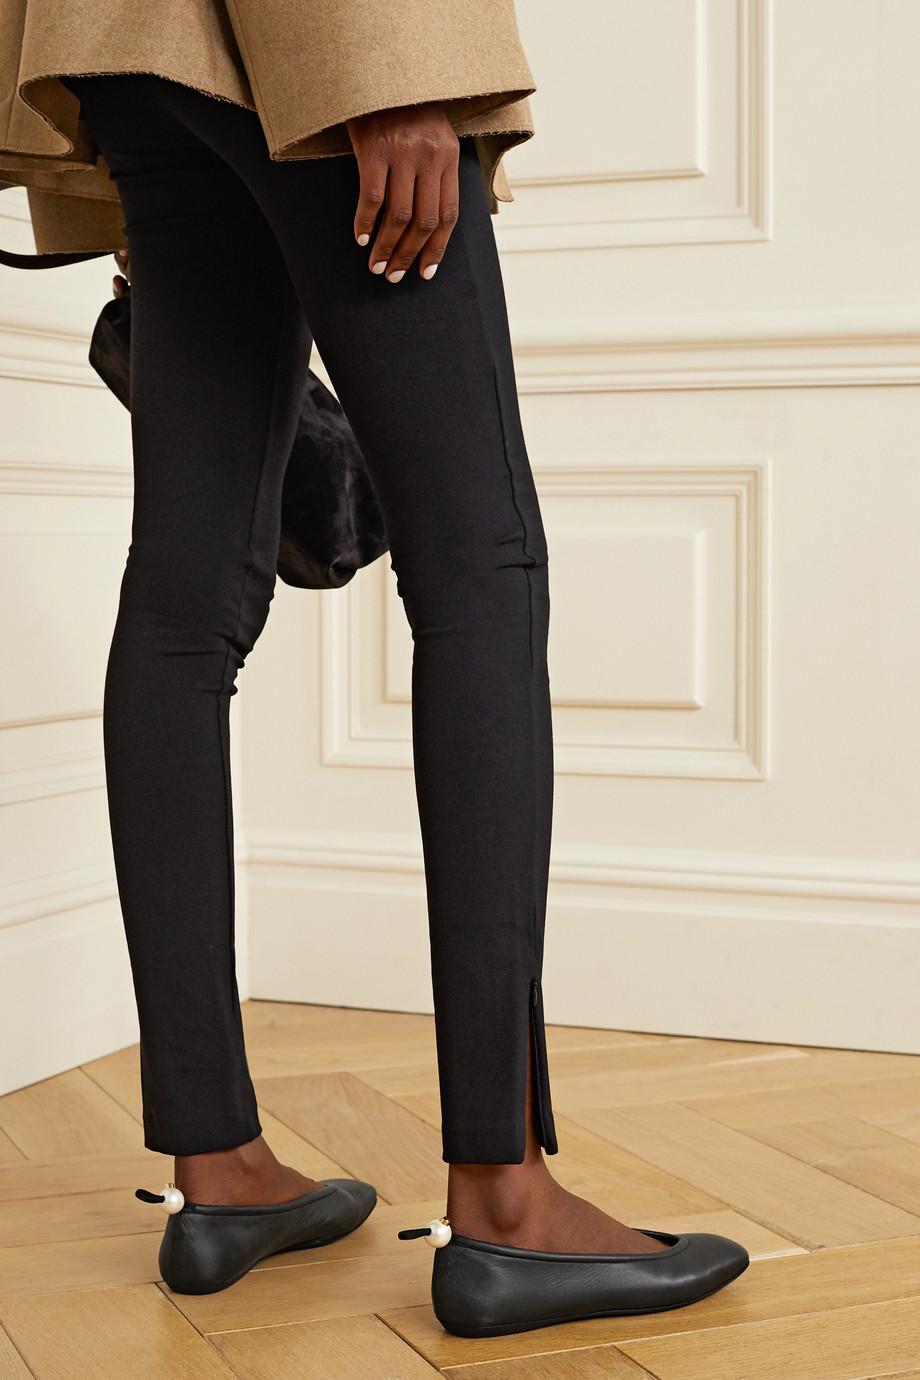 Nicholas Kirkwood Delfi faux pearl-embellished leather ballet flats